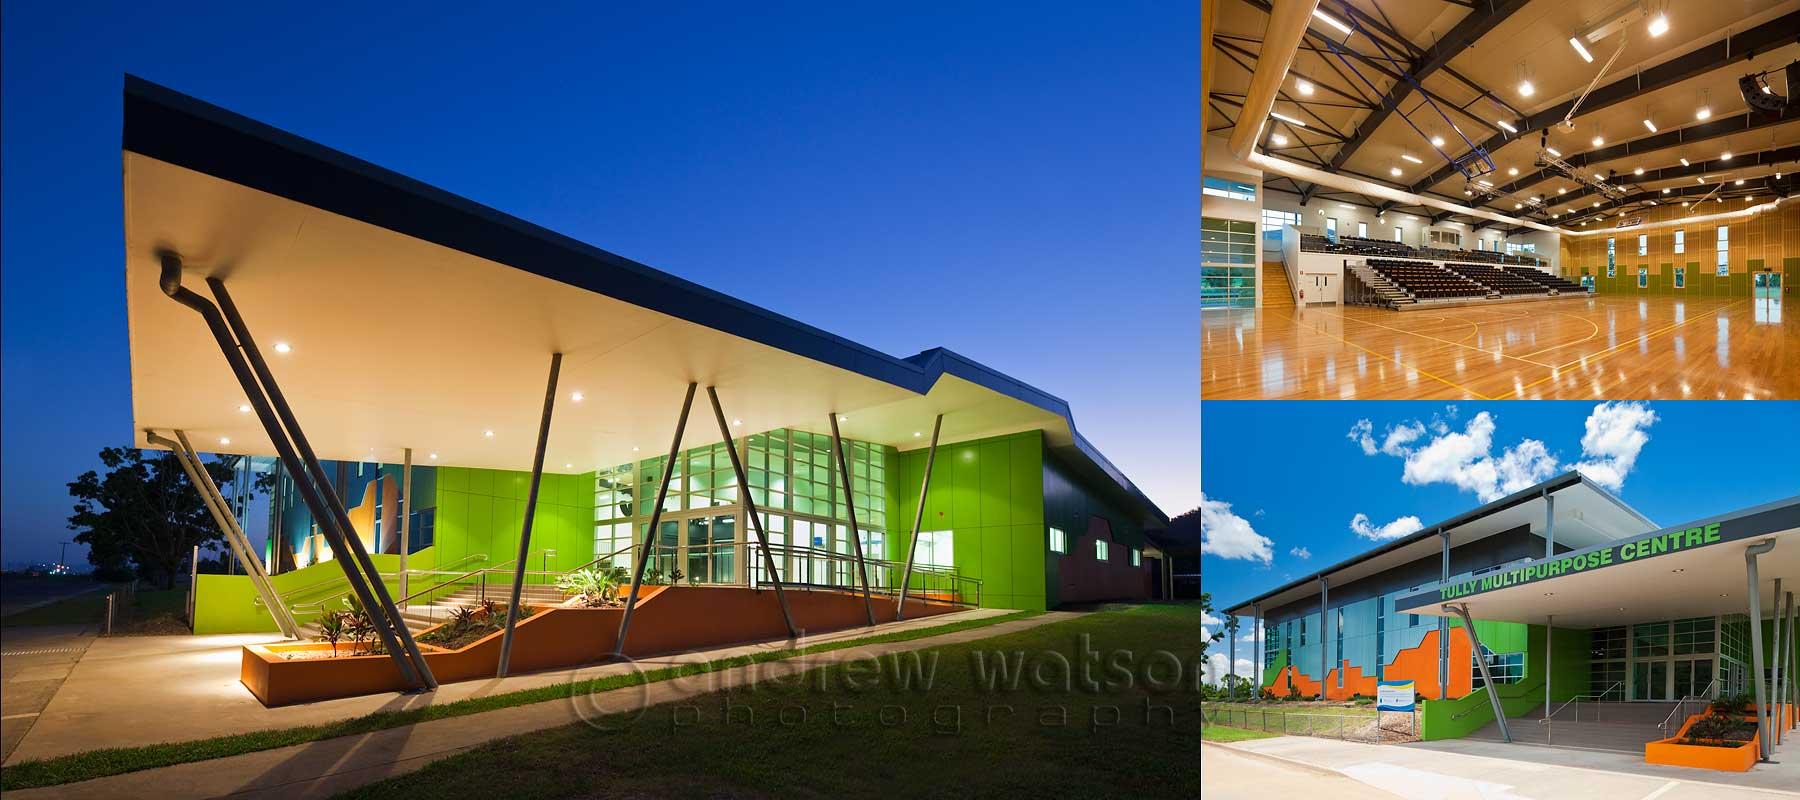 Architecture photography - Tully Multi-Purpose Centre